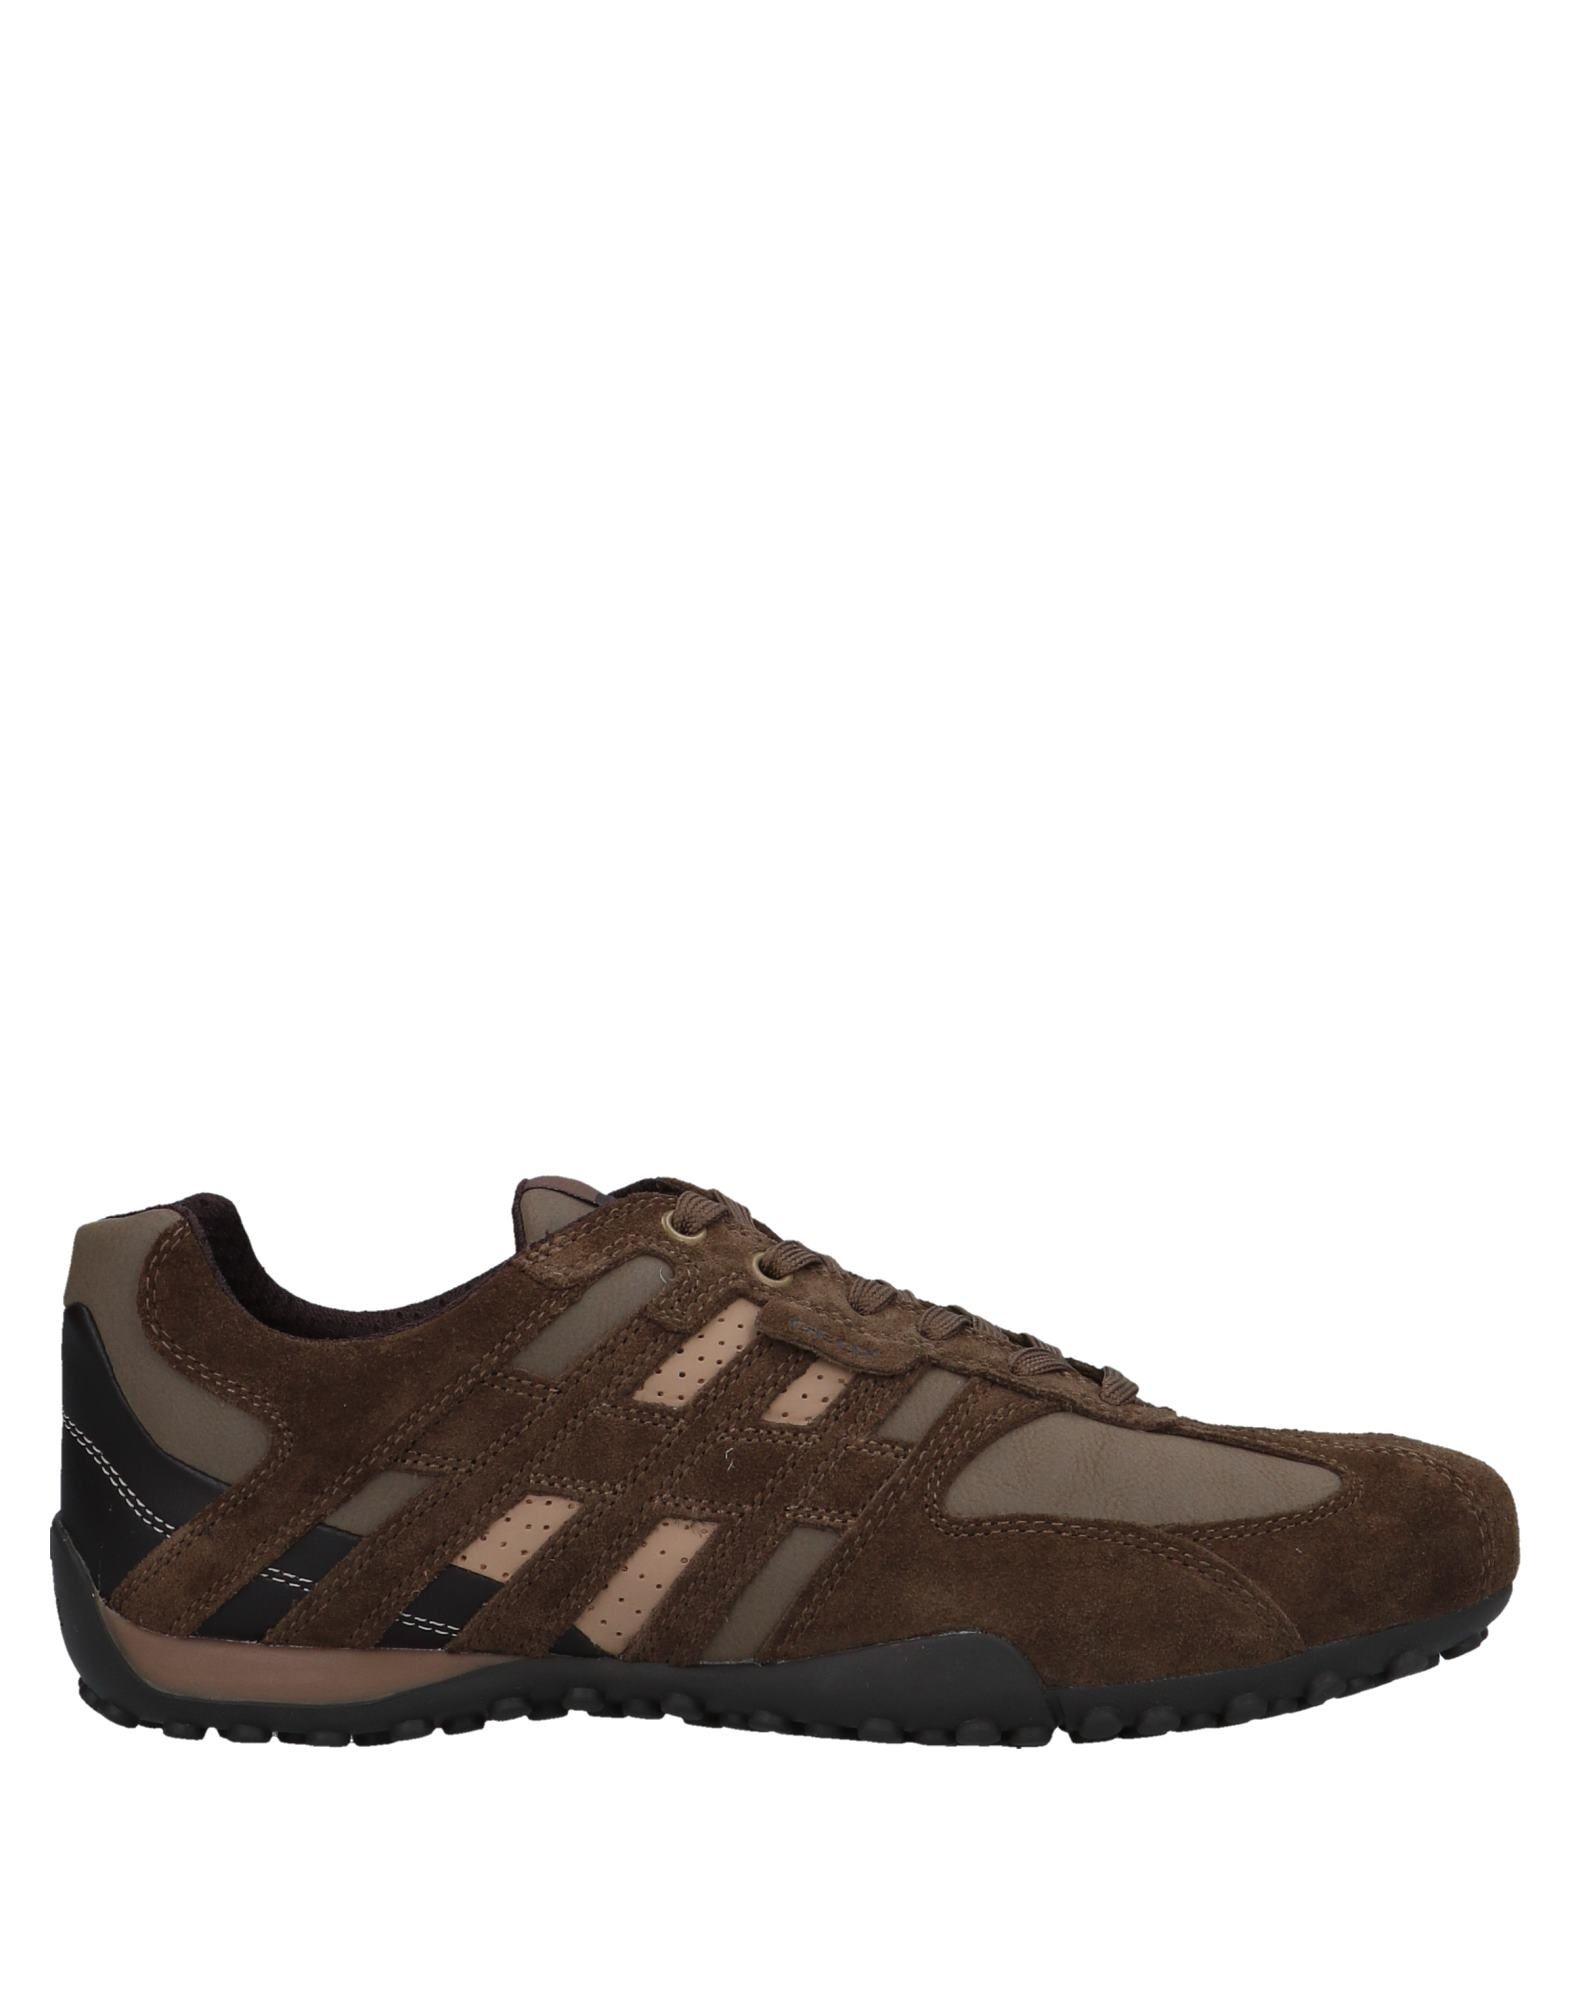 Geox Sneakers Herren  11540233BG Heiße Schuhe